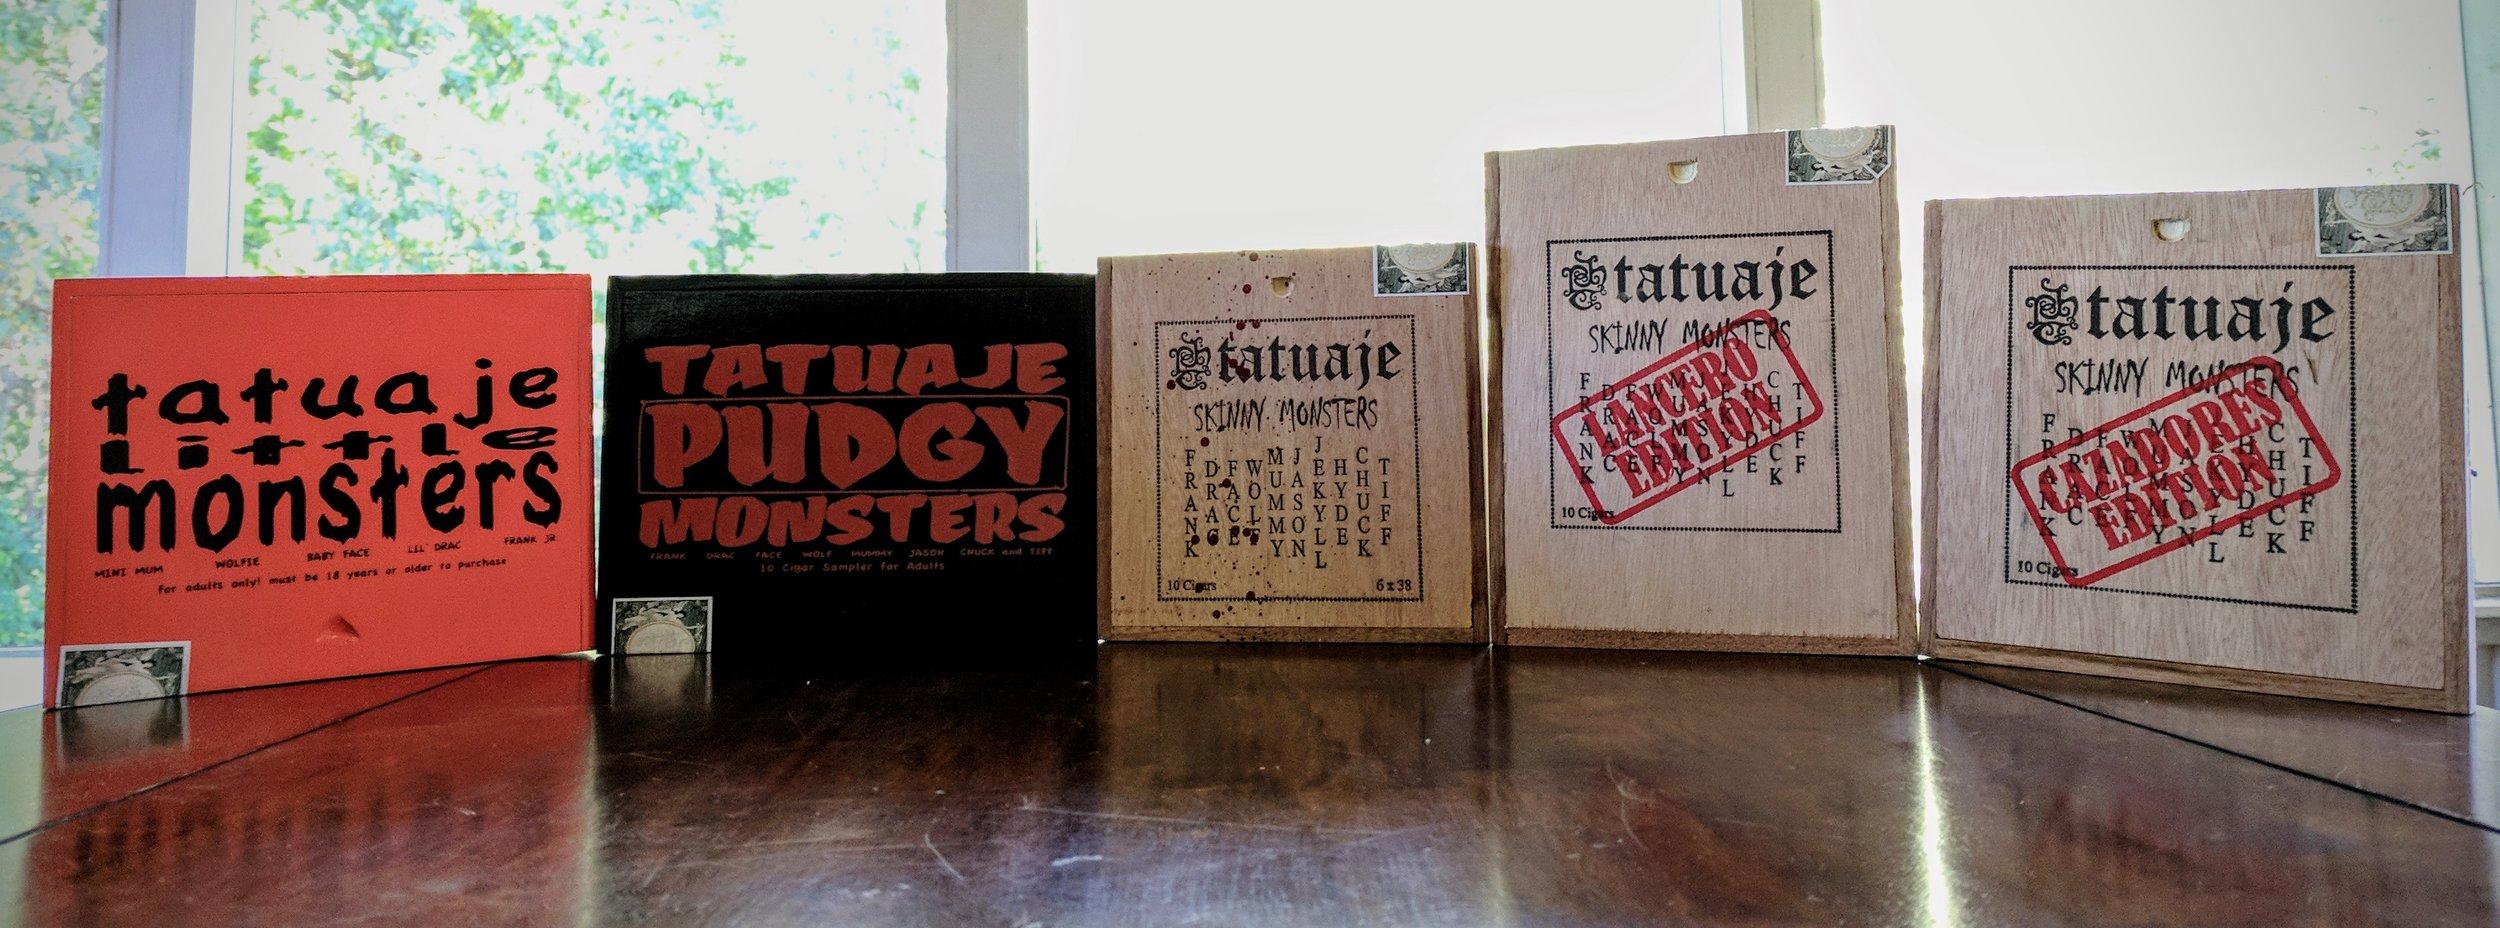 Monster Collection - Samplers.jpg